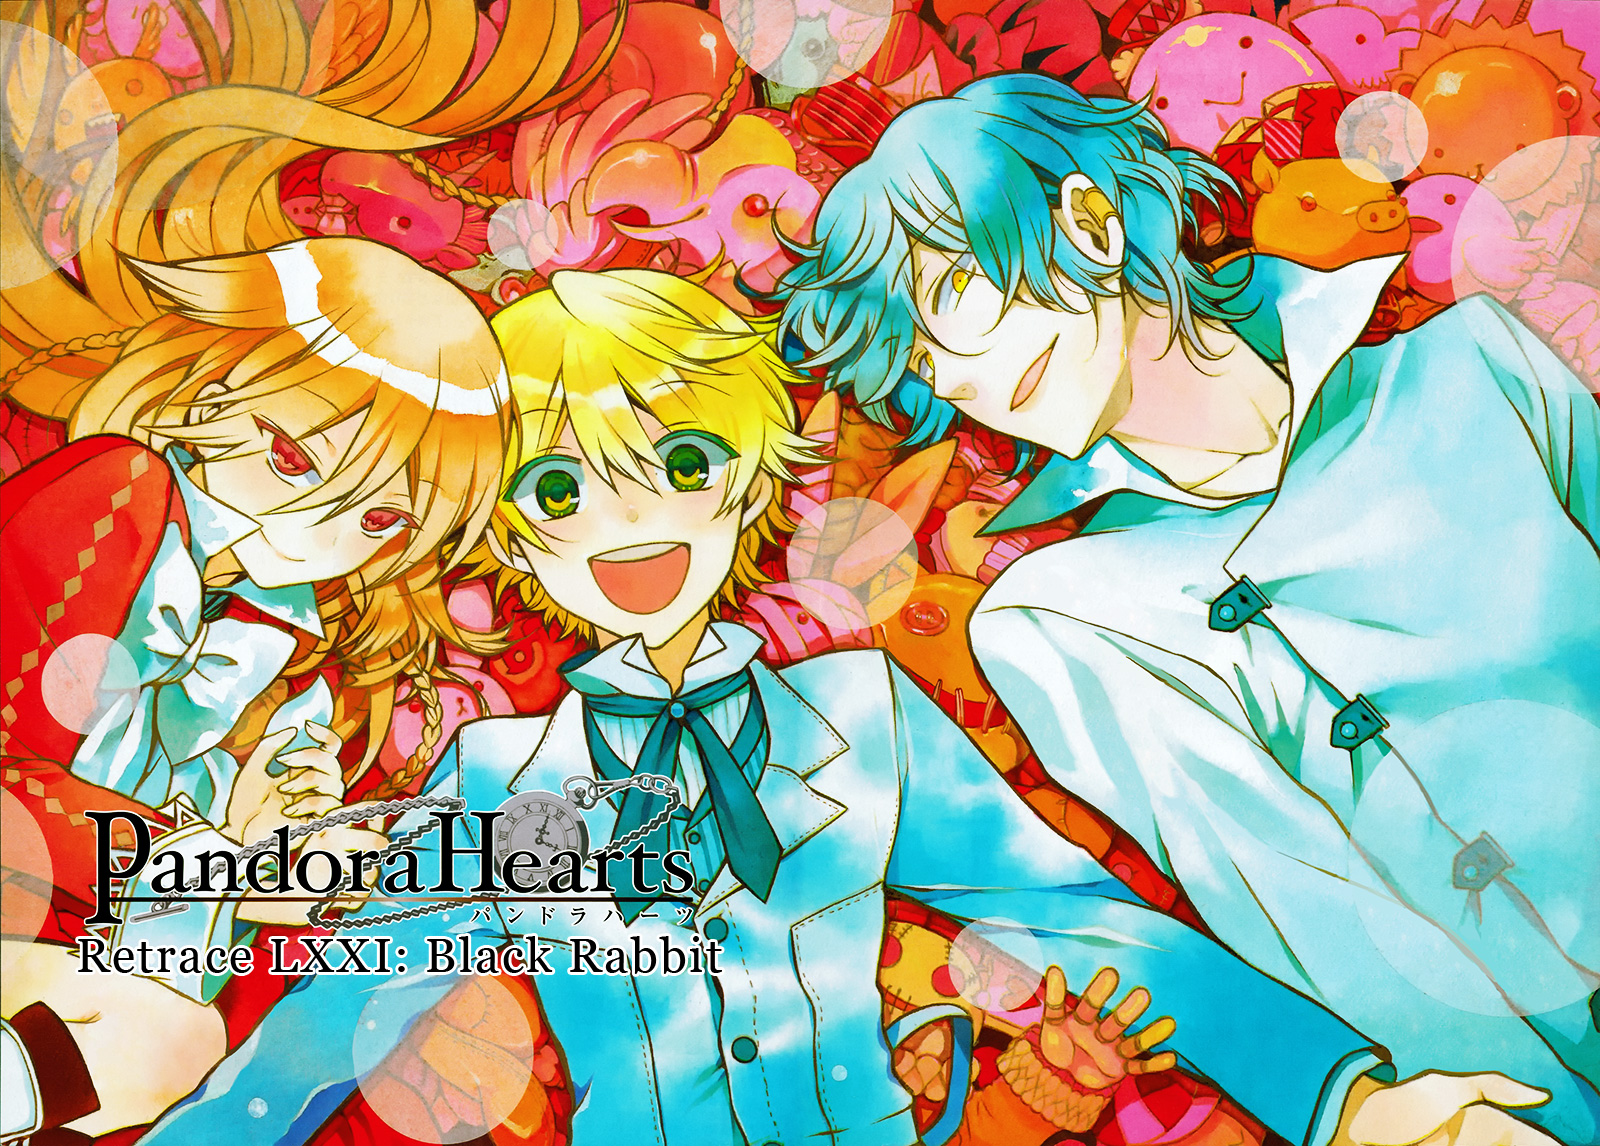 Pandora Hearts chương 071 - retrace: lxxi black rabbit trang 2